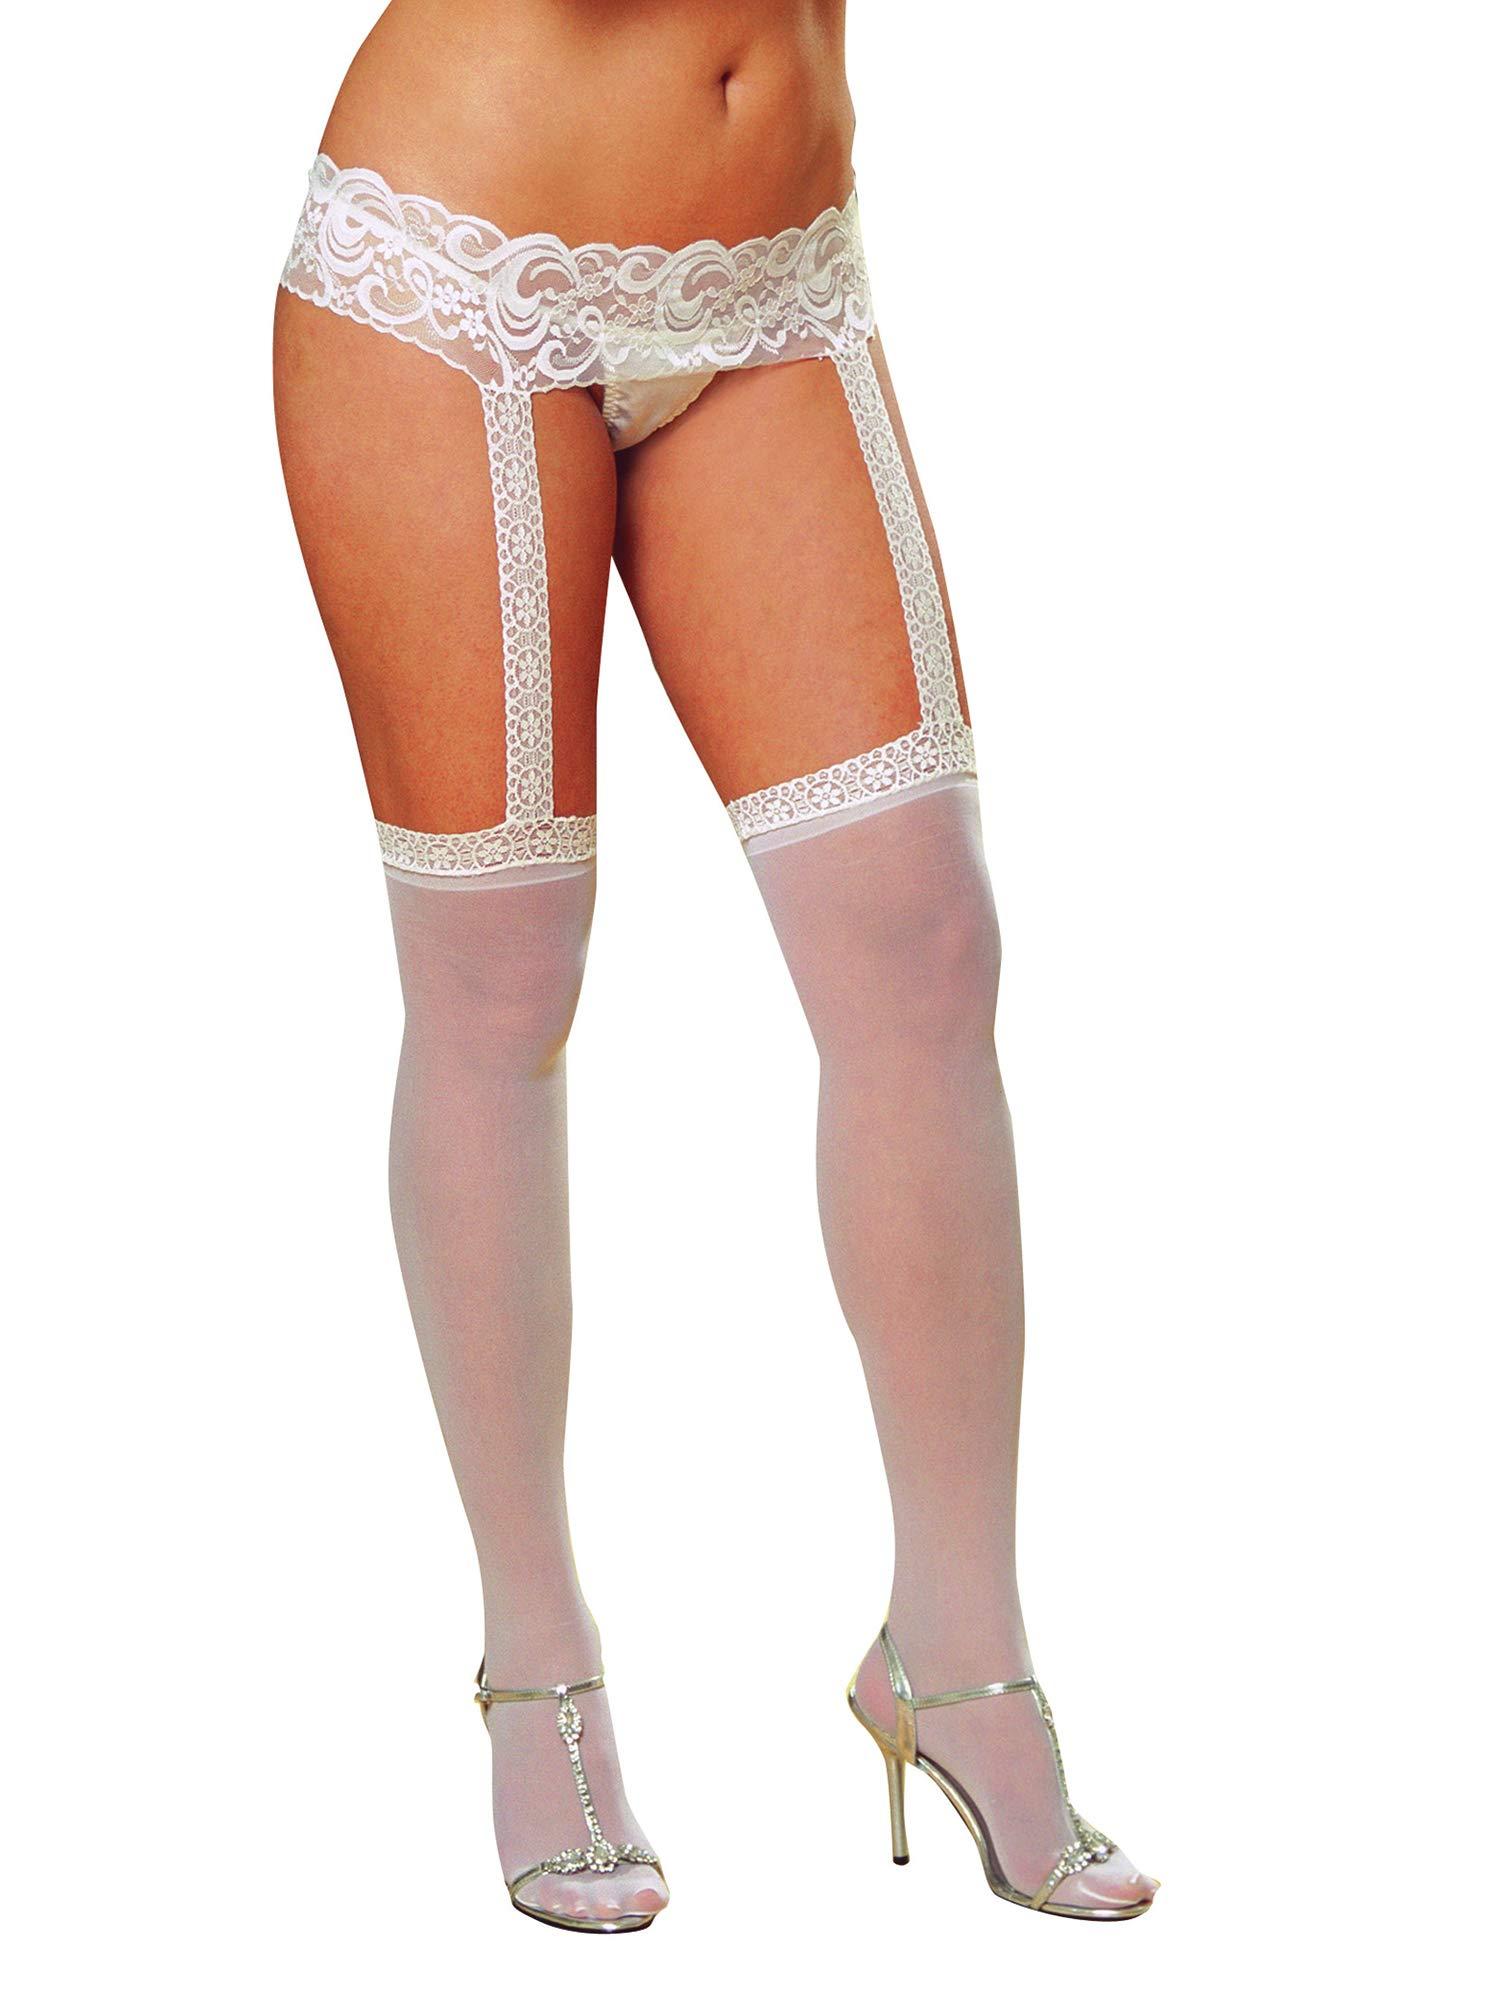 Dreamgirl Women's Plus-Size Sheer Garter Belt and Stockings Set